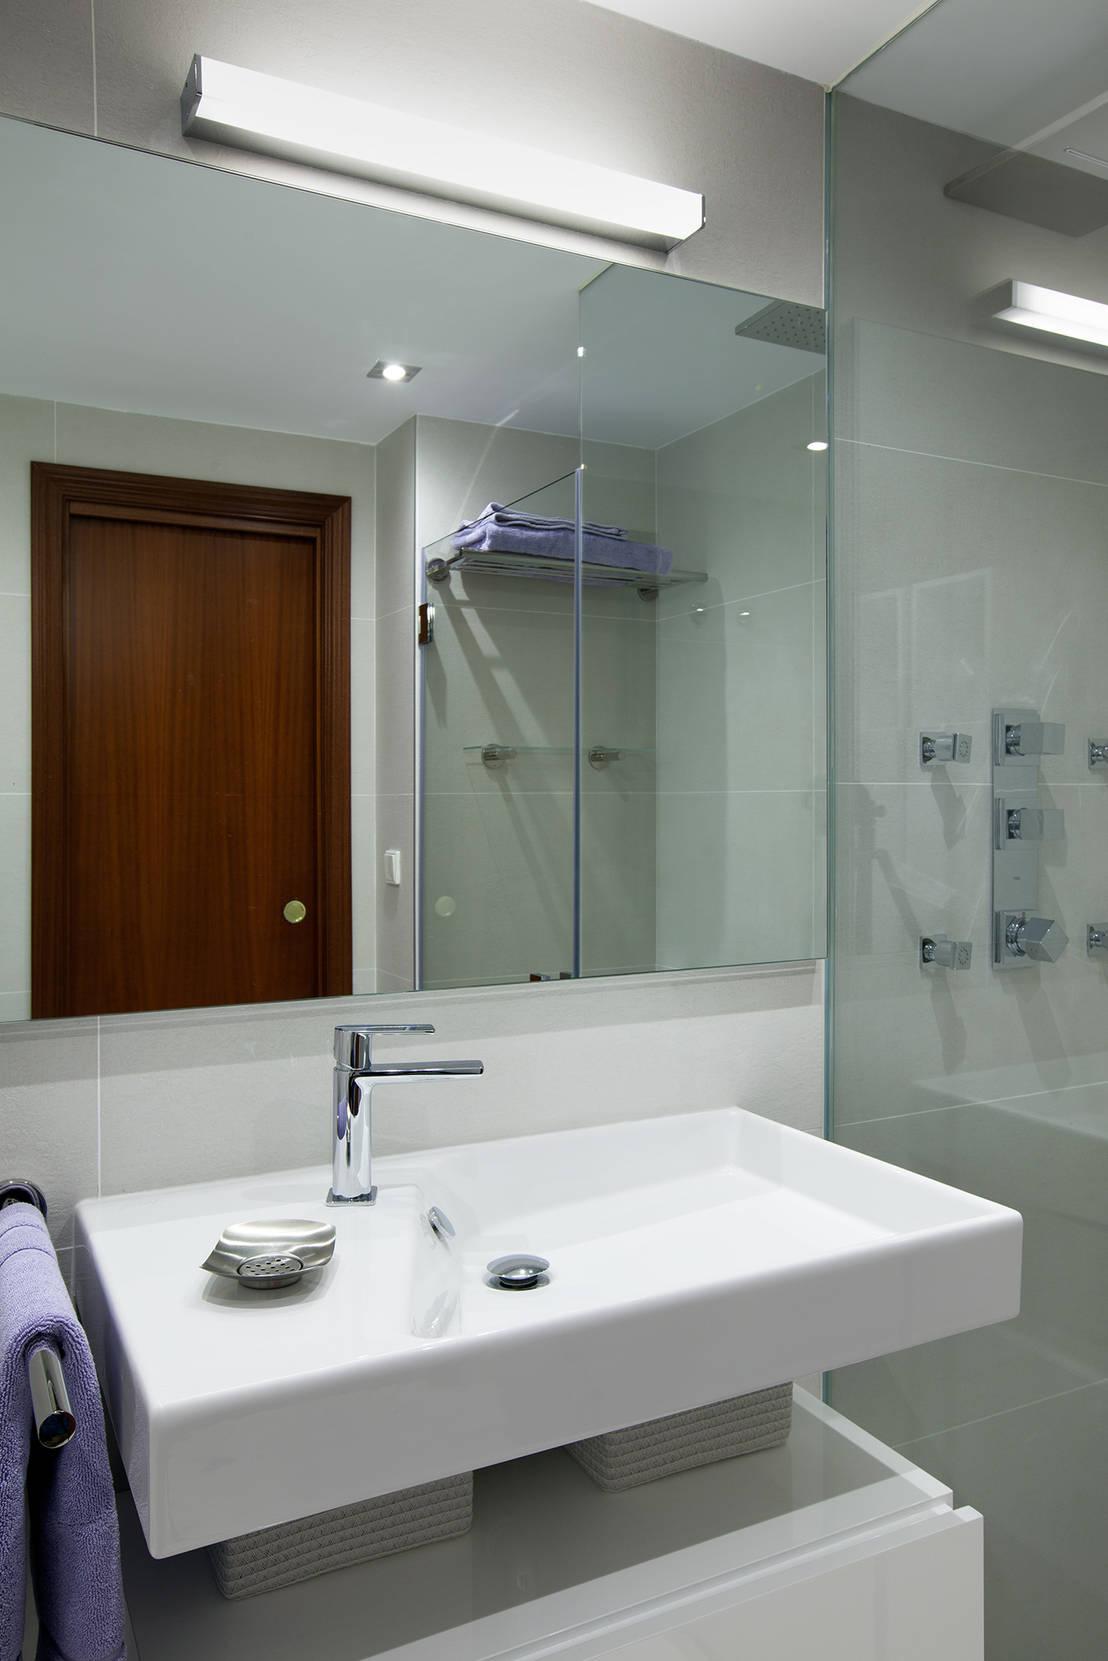 Baño Estilo Contemporaneo:Baño contemporaneo diseño L'AGABE Interiorismo de L'AGABE